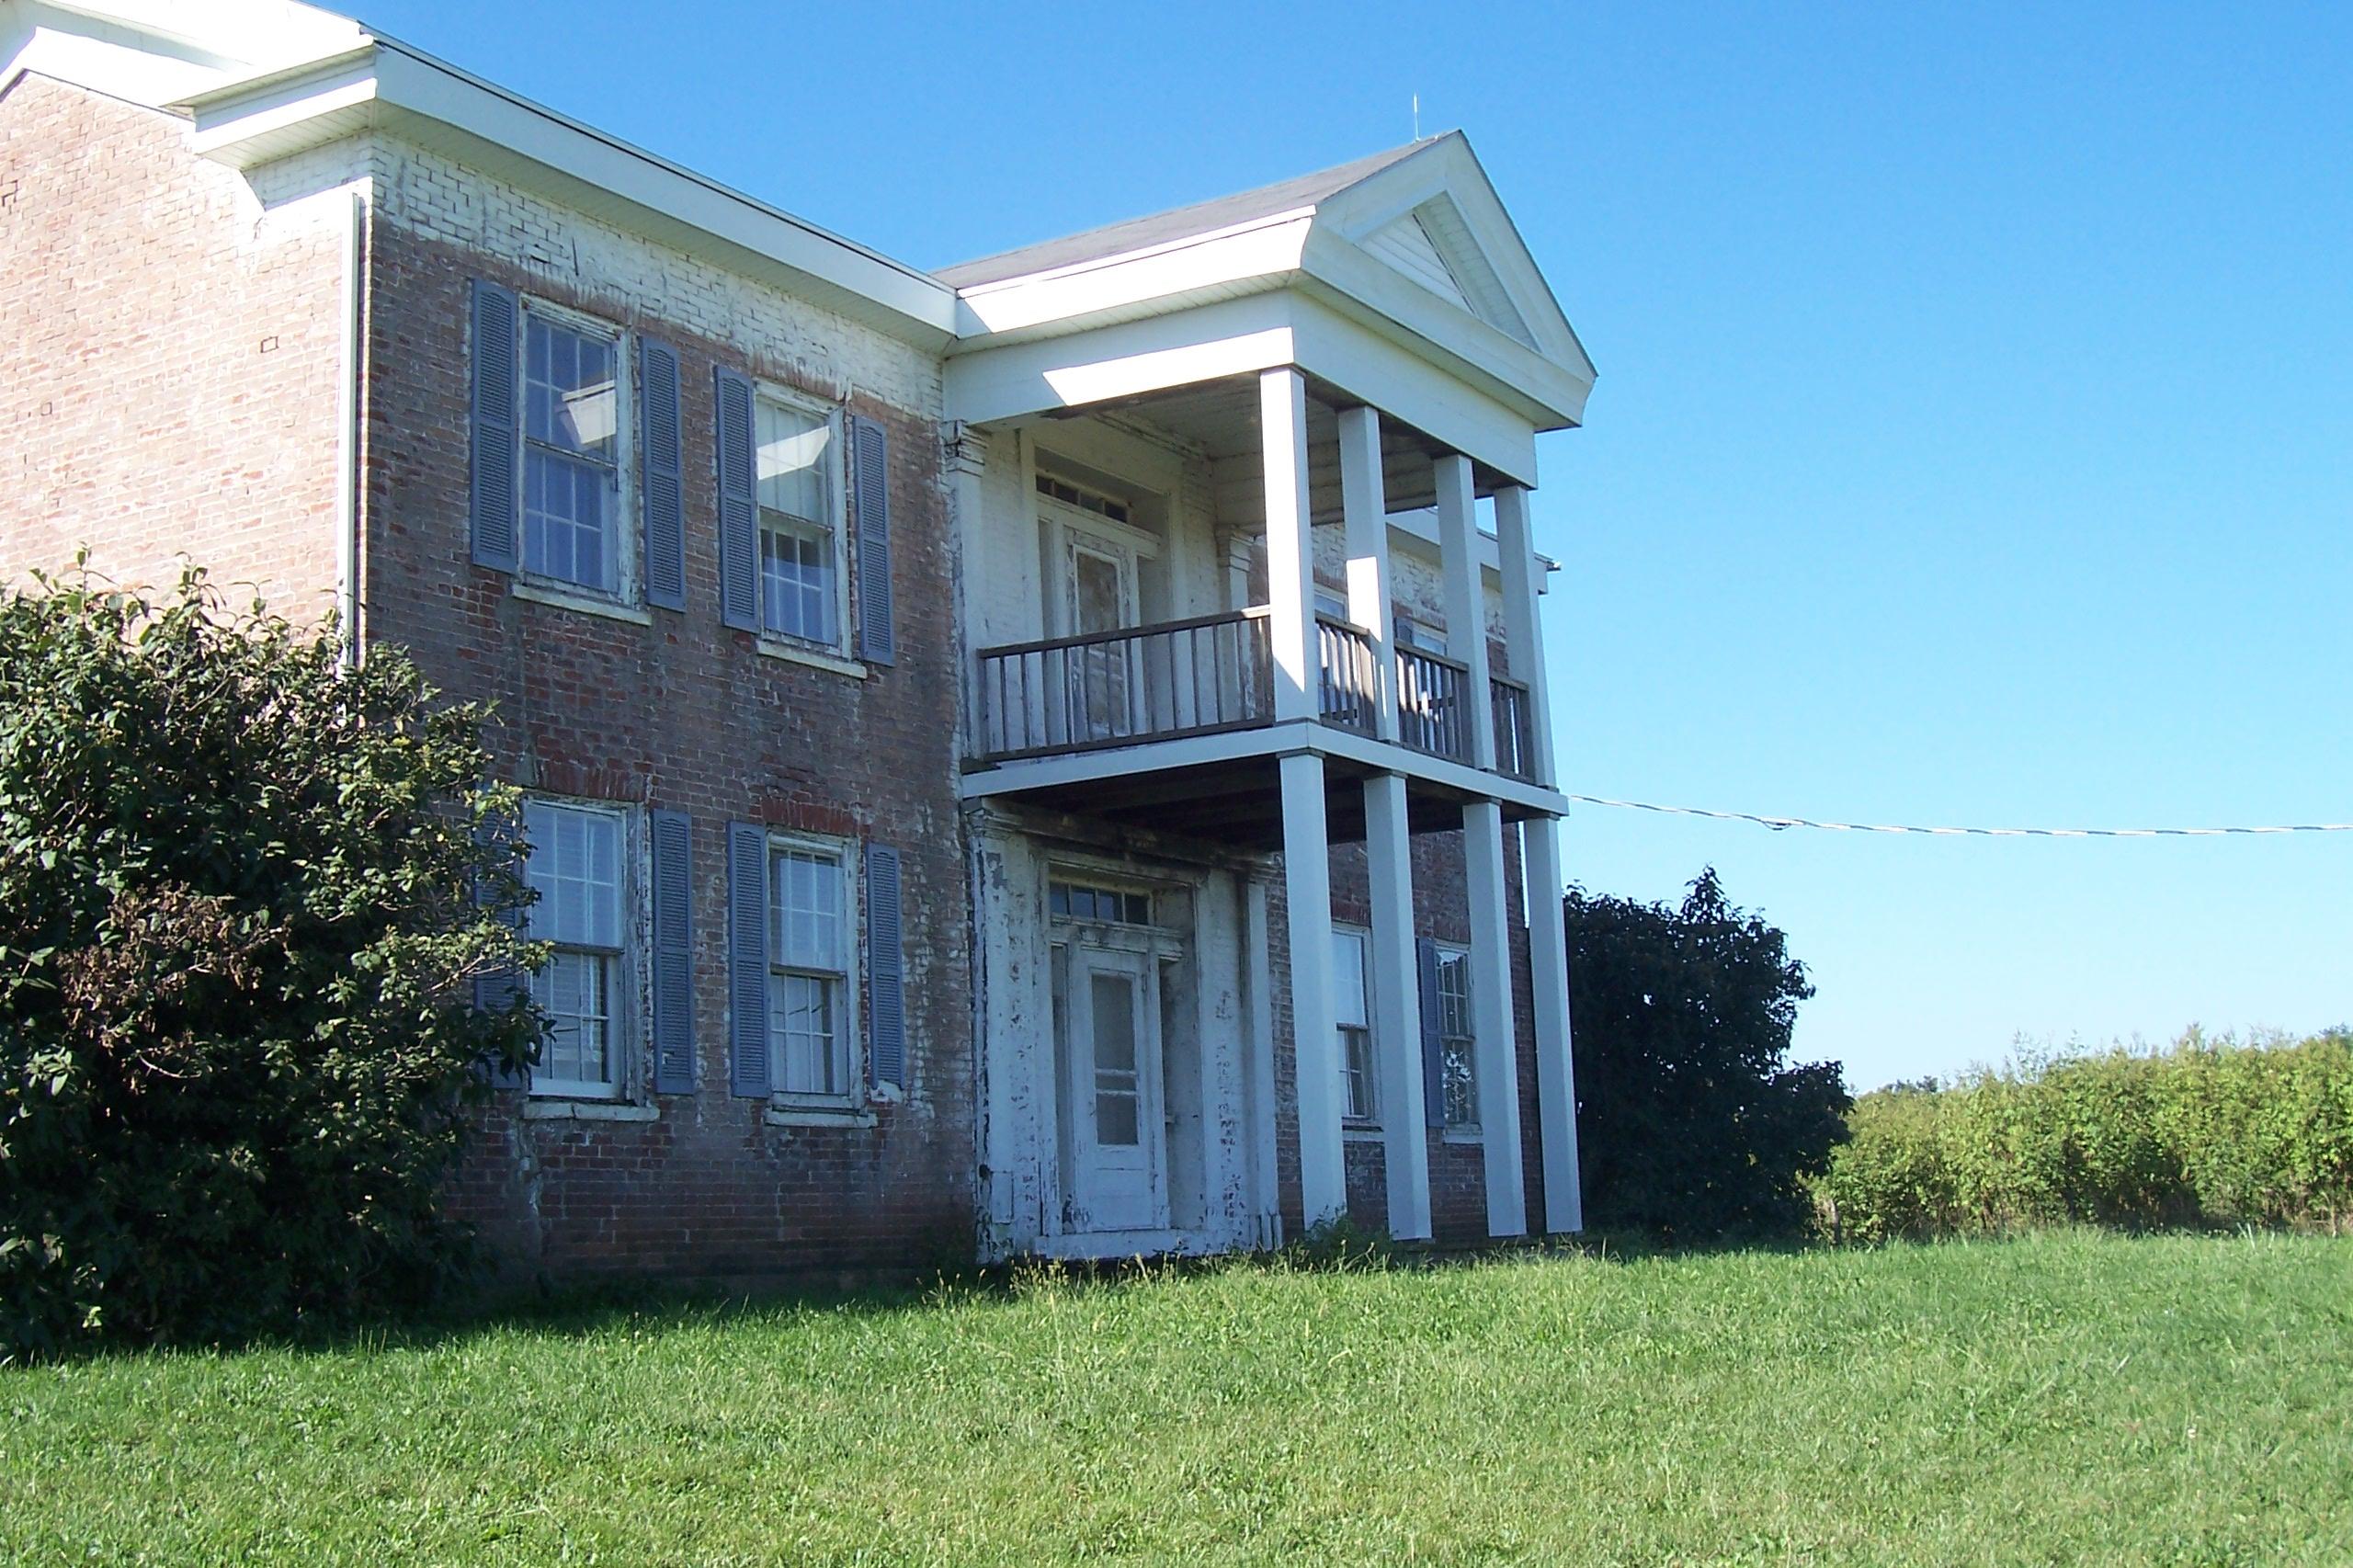 39719 HH Hwy, Rayville, Missouri 64084